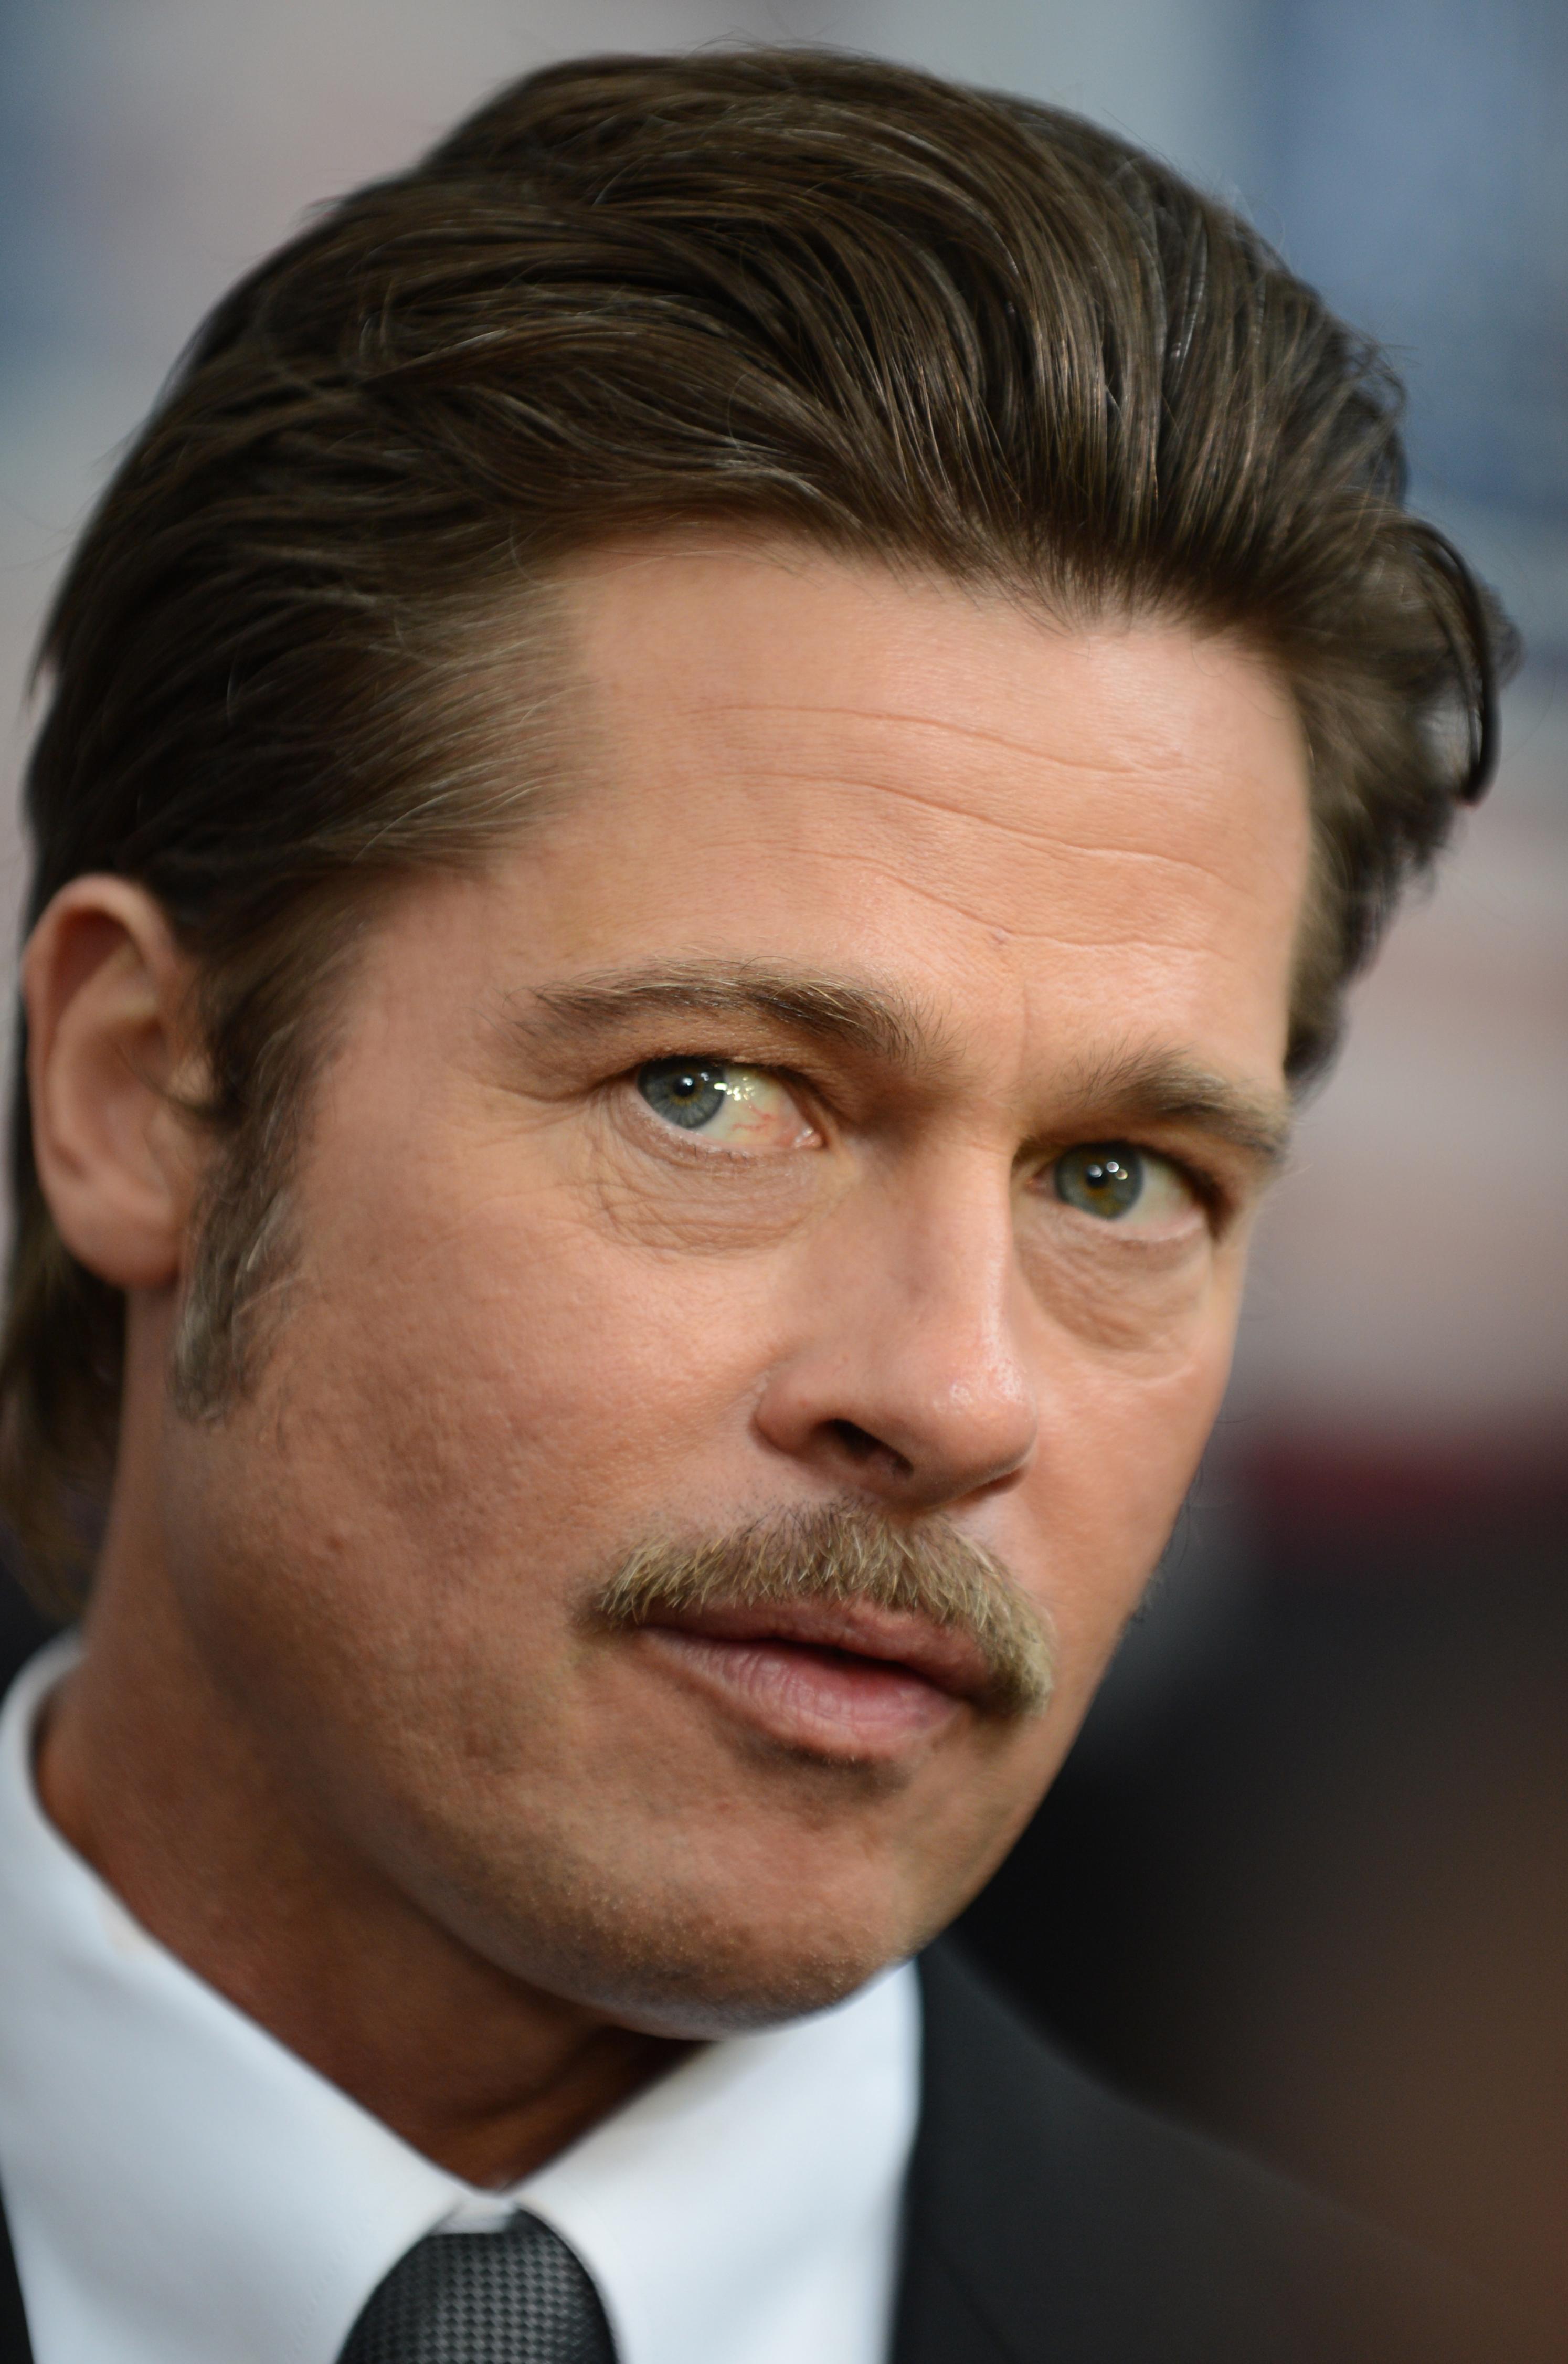 1000+ images about Brad Pitt on Pinterest Brad Pitt